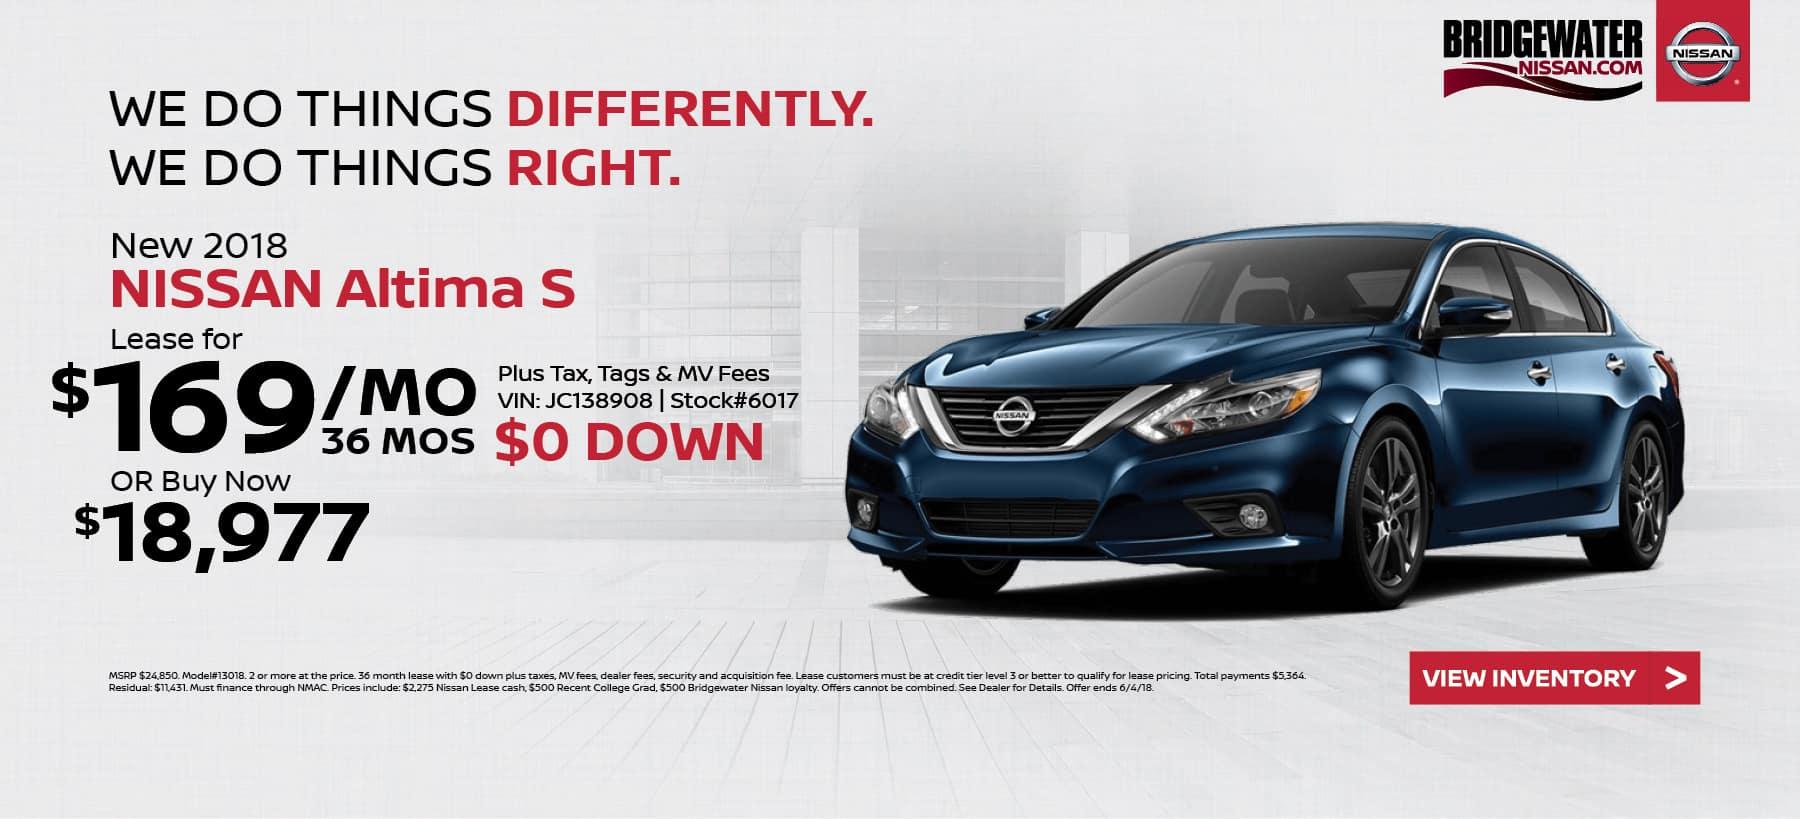 Nissan_Altima Bridgewater Nissan May Homepage Offer